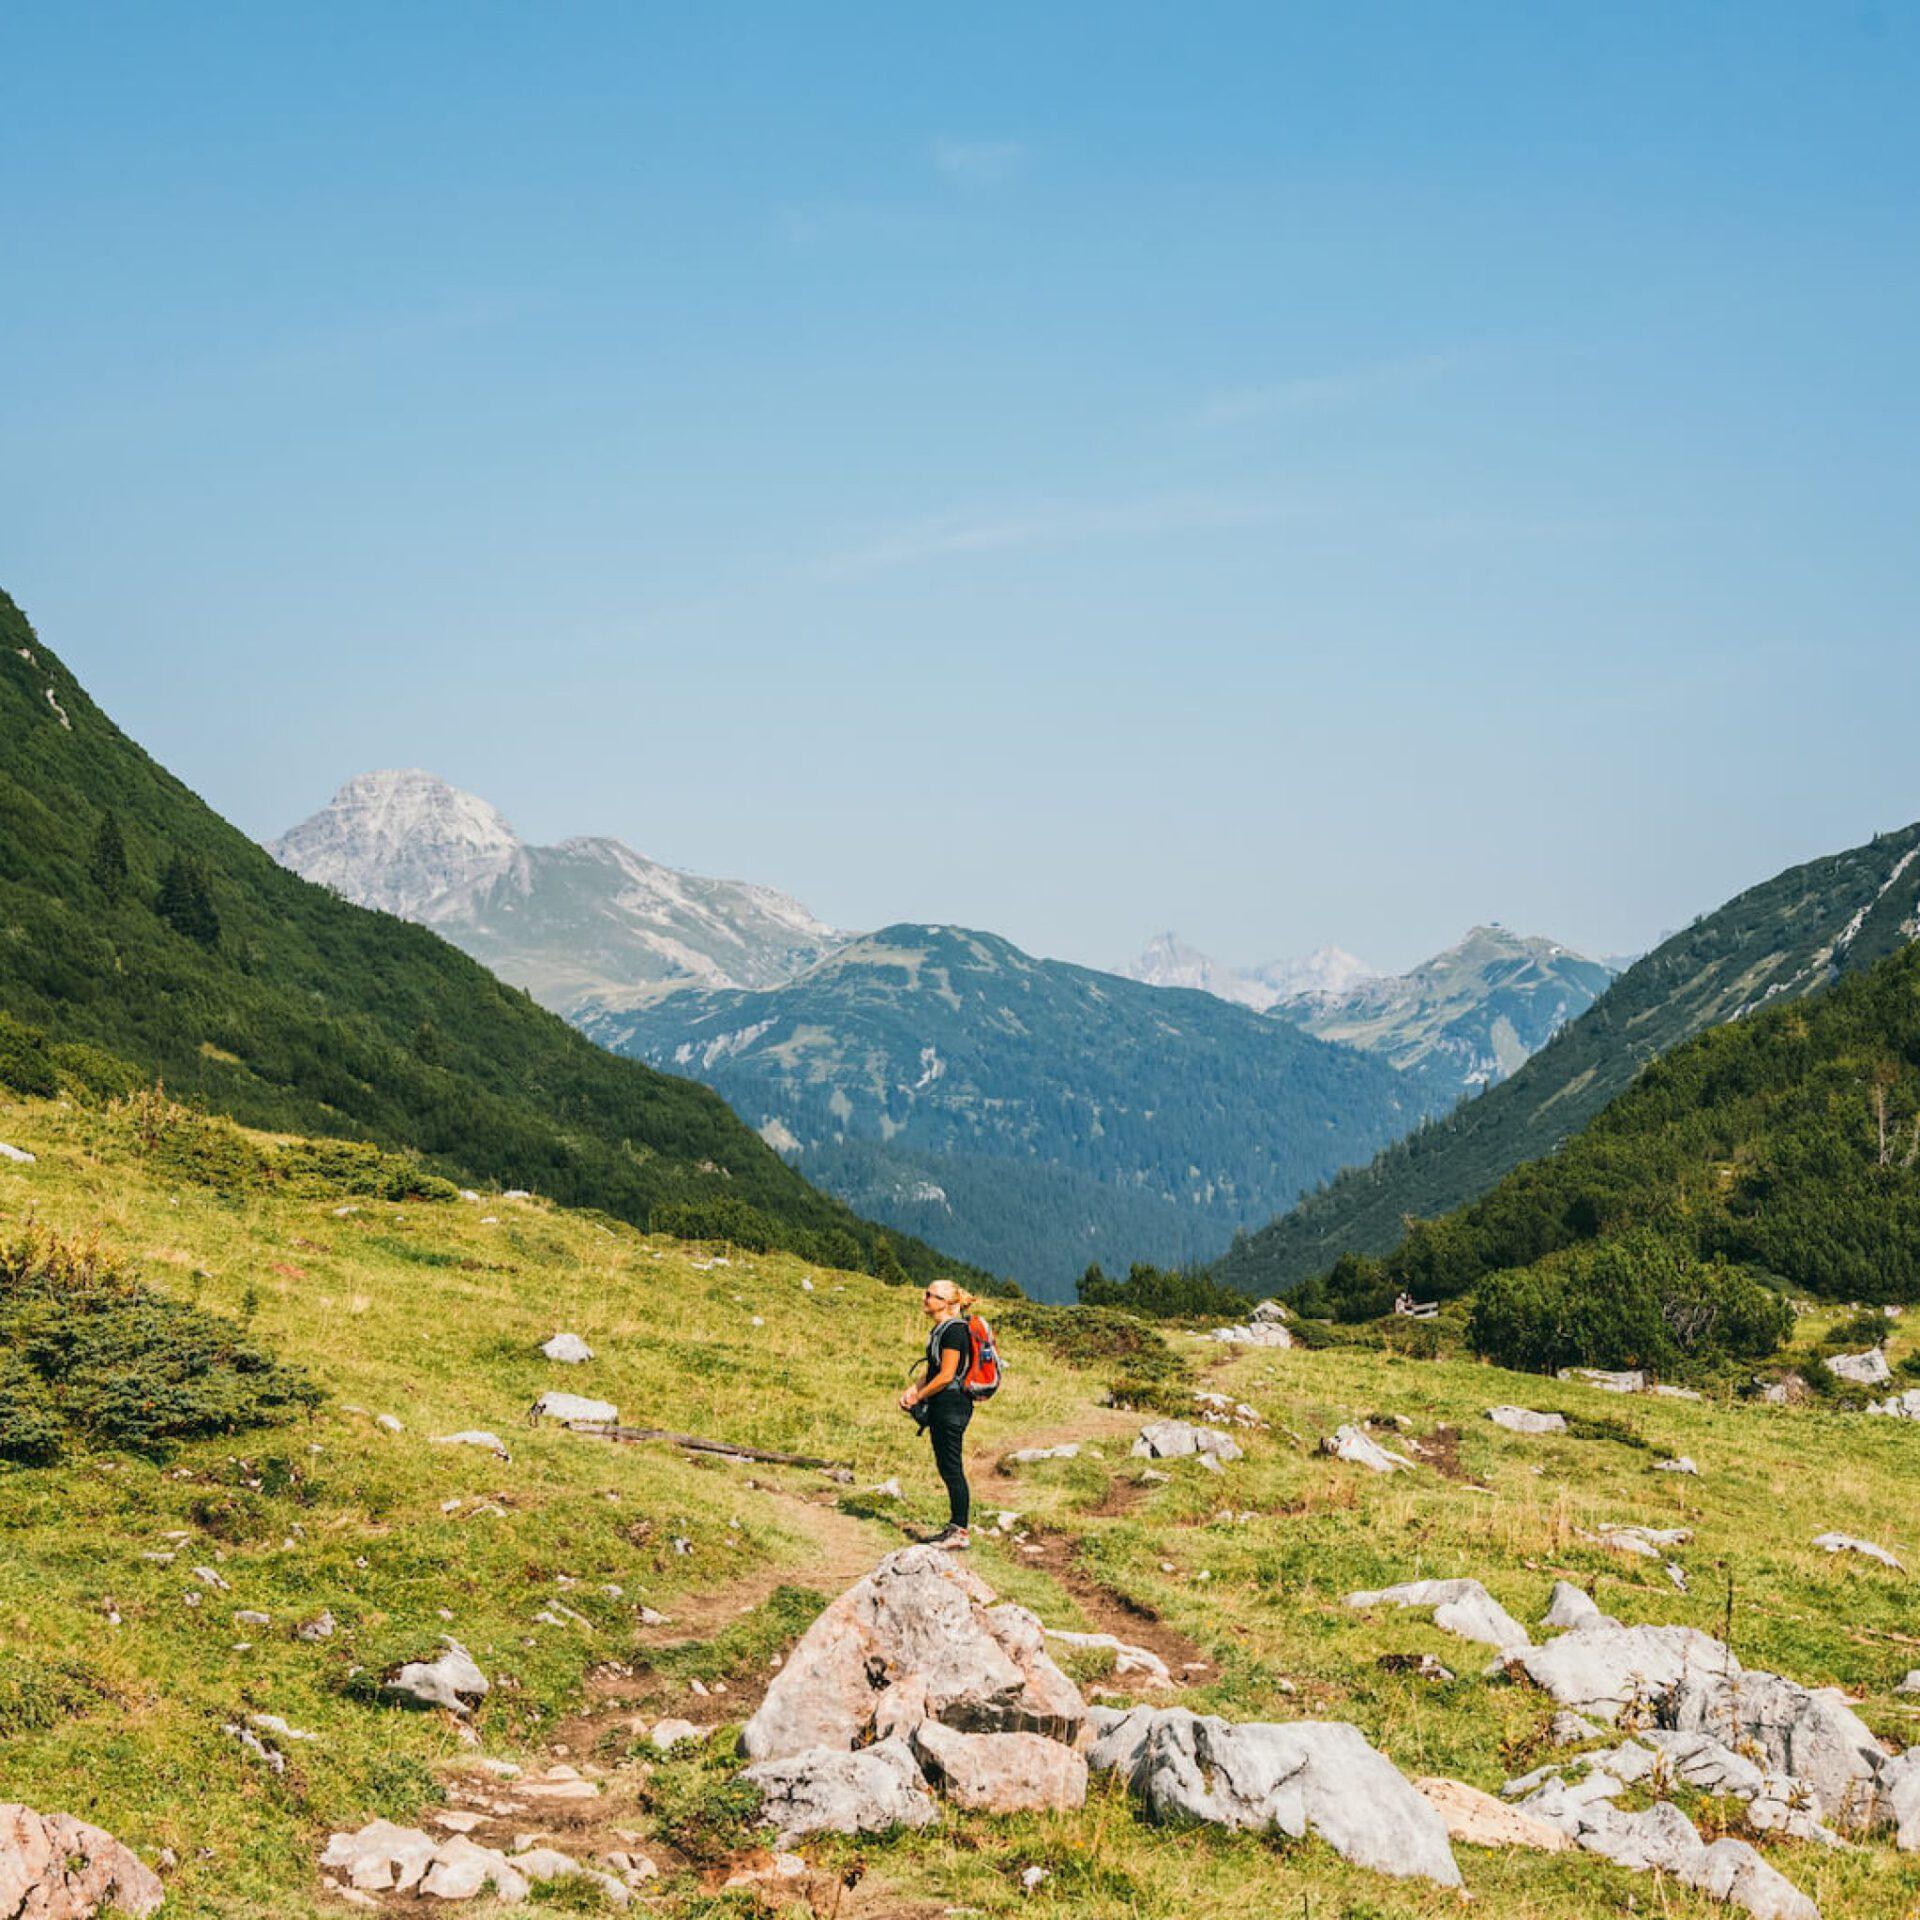 vorarlberg lech zürs lechweg erste-etappe wandern frau berge tal